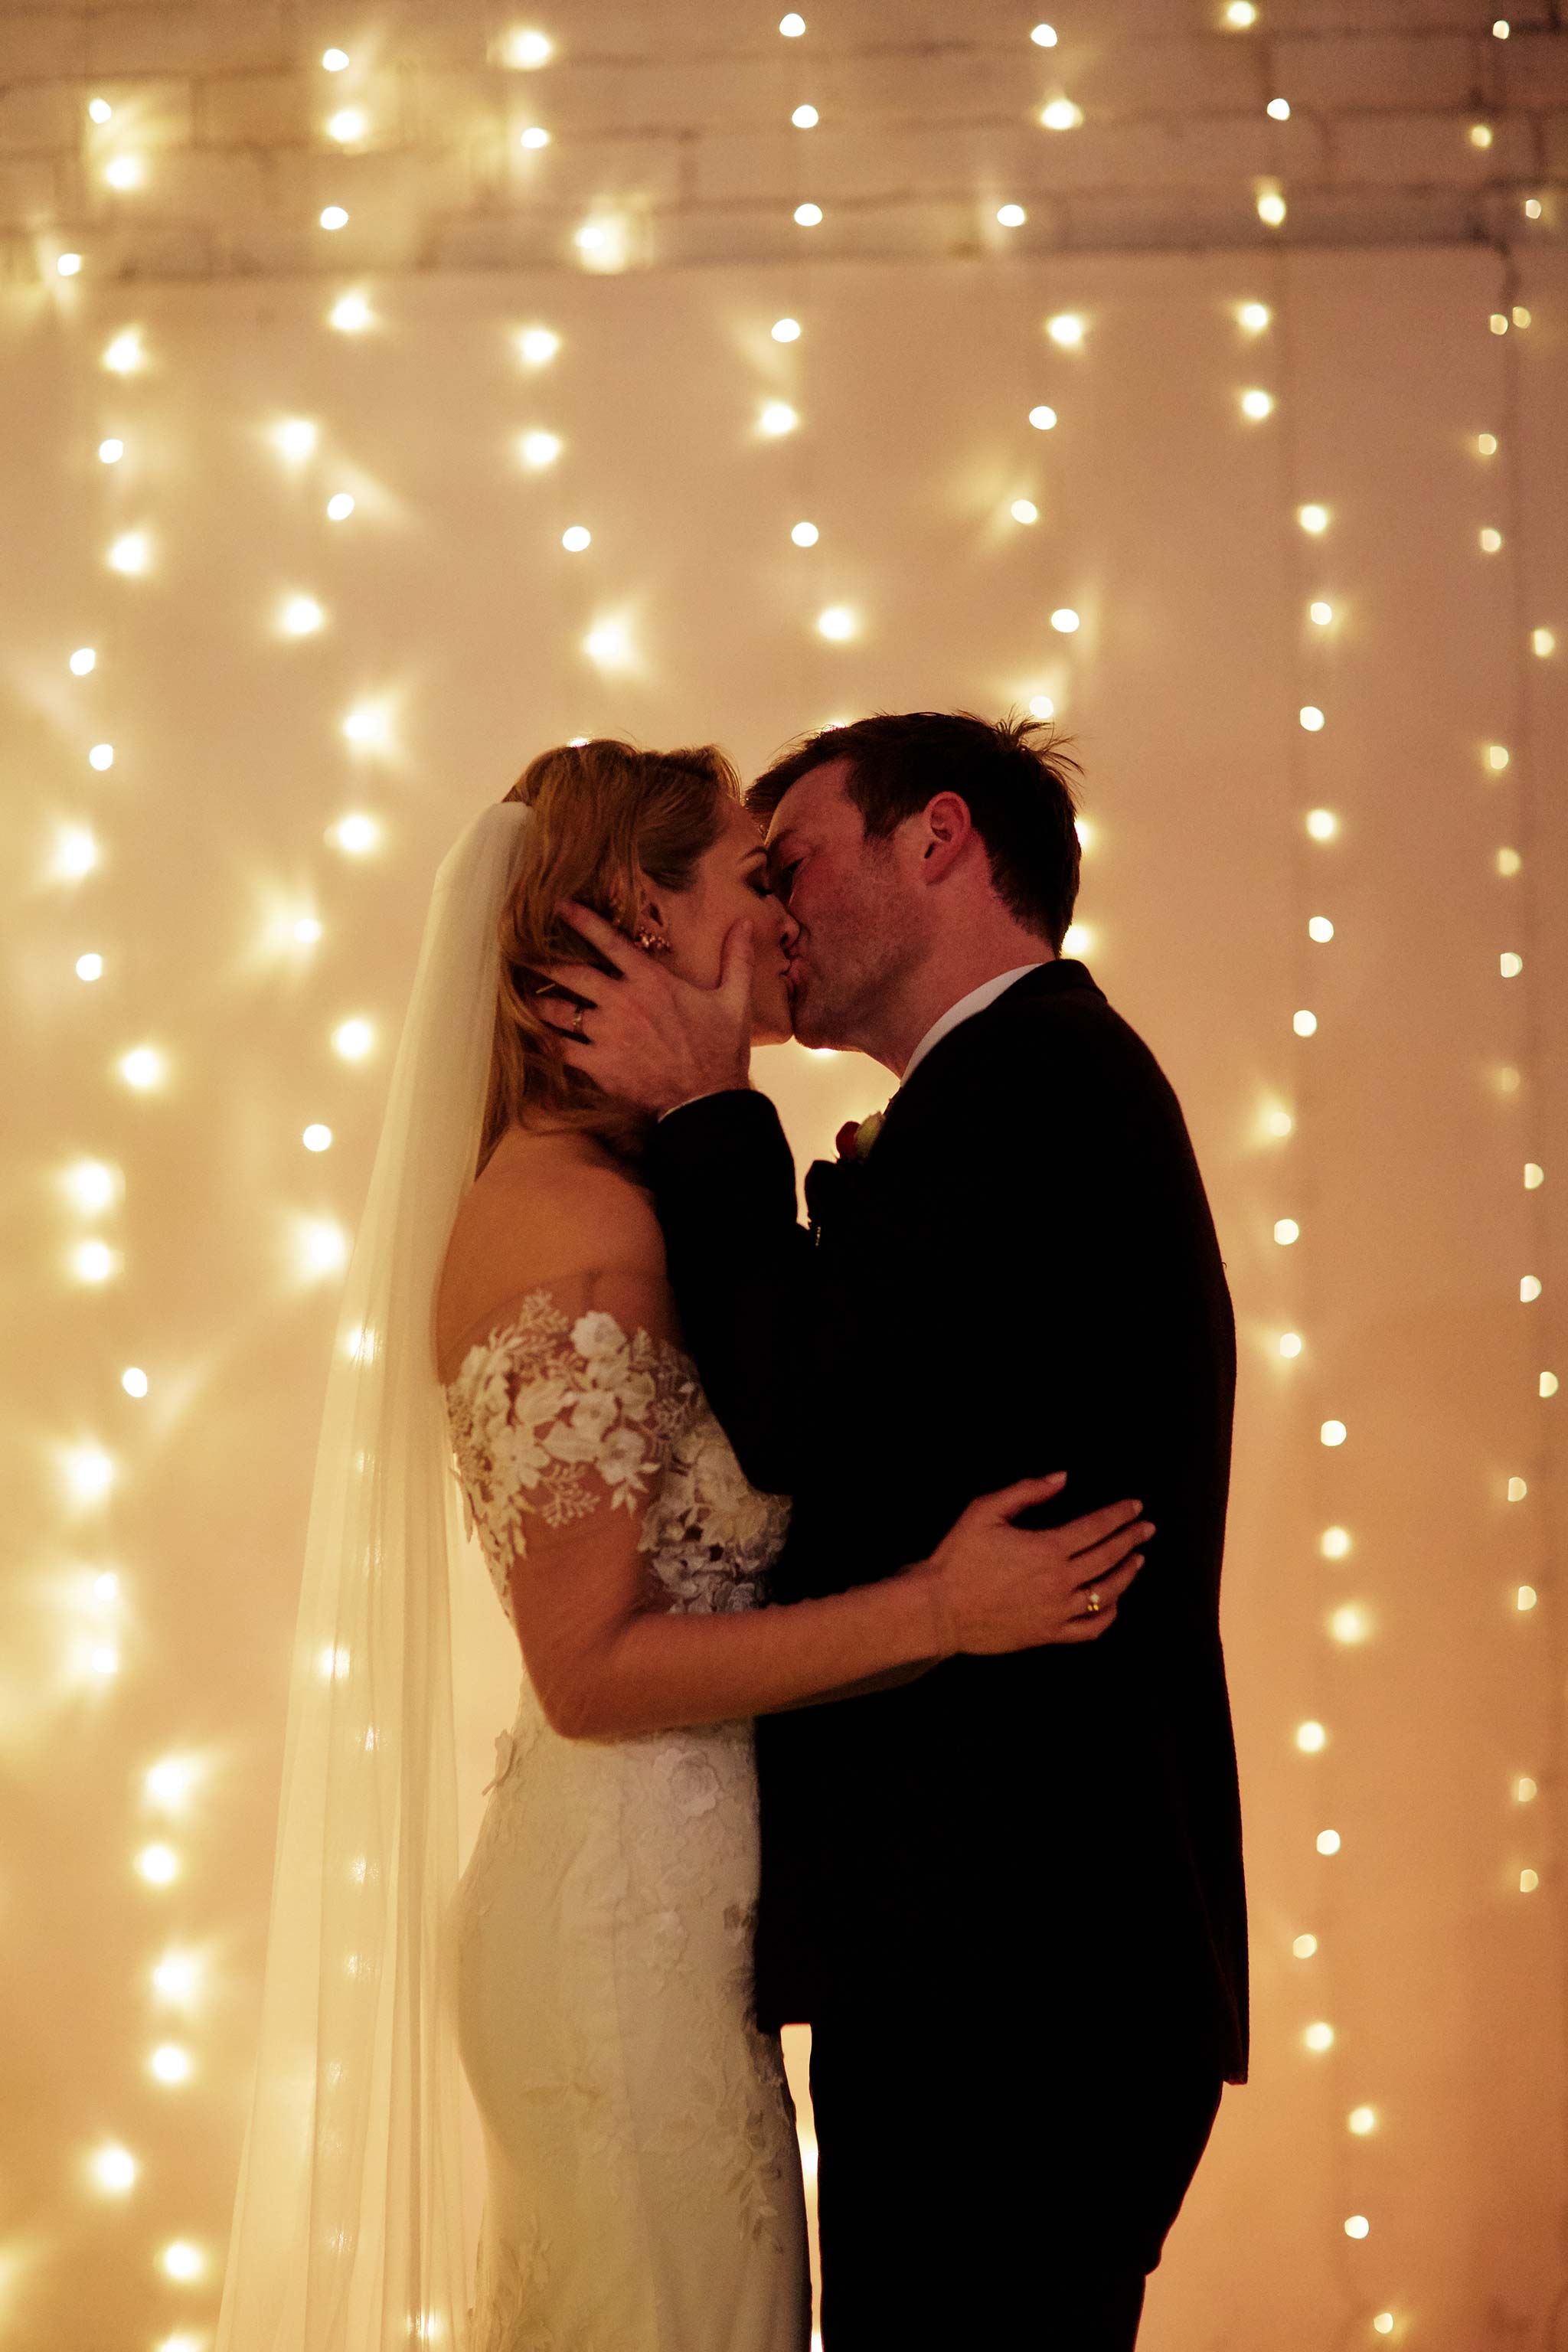 Melbourne-Wedding-Photographer-smartartz-gallery-ceremony-kiss